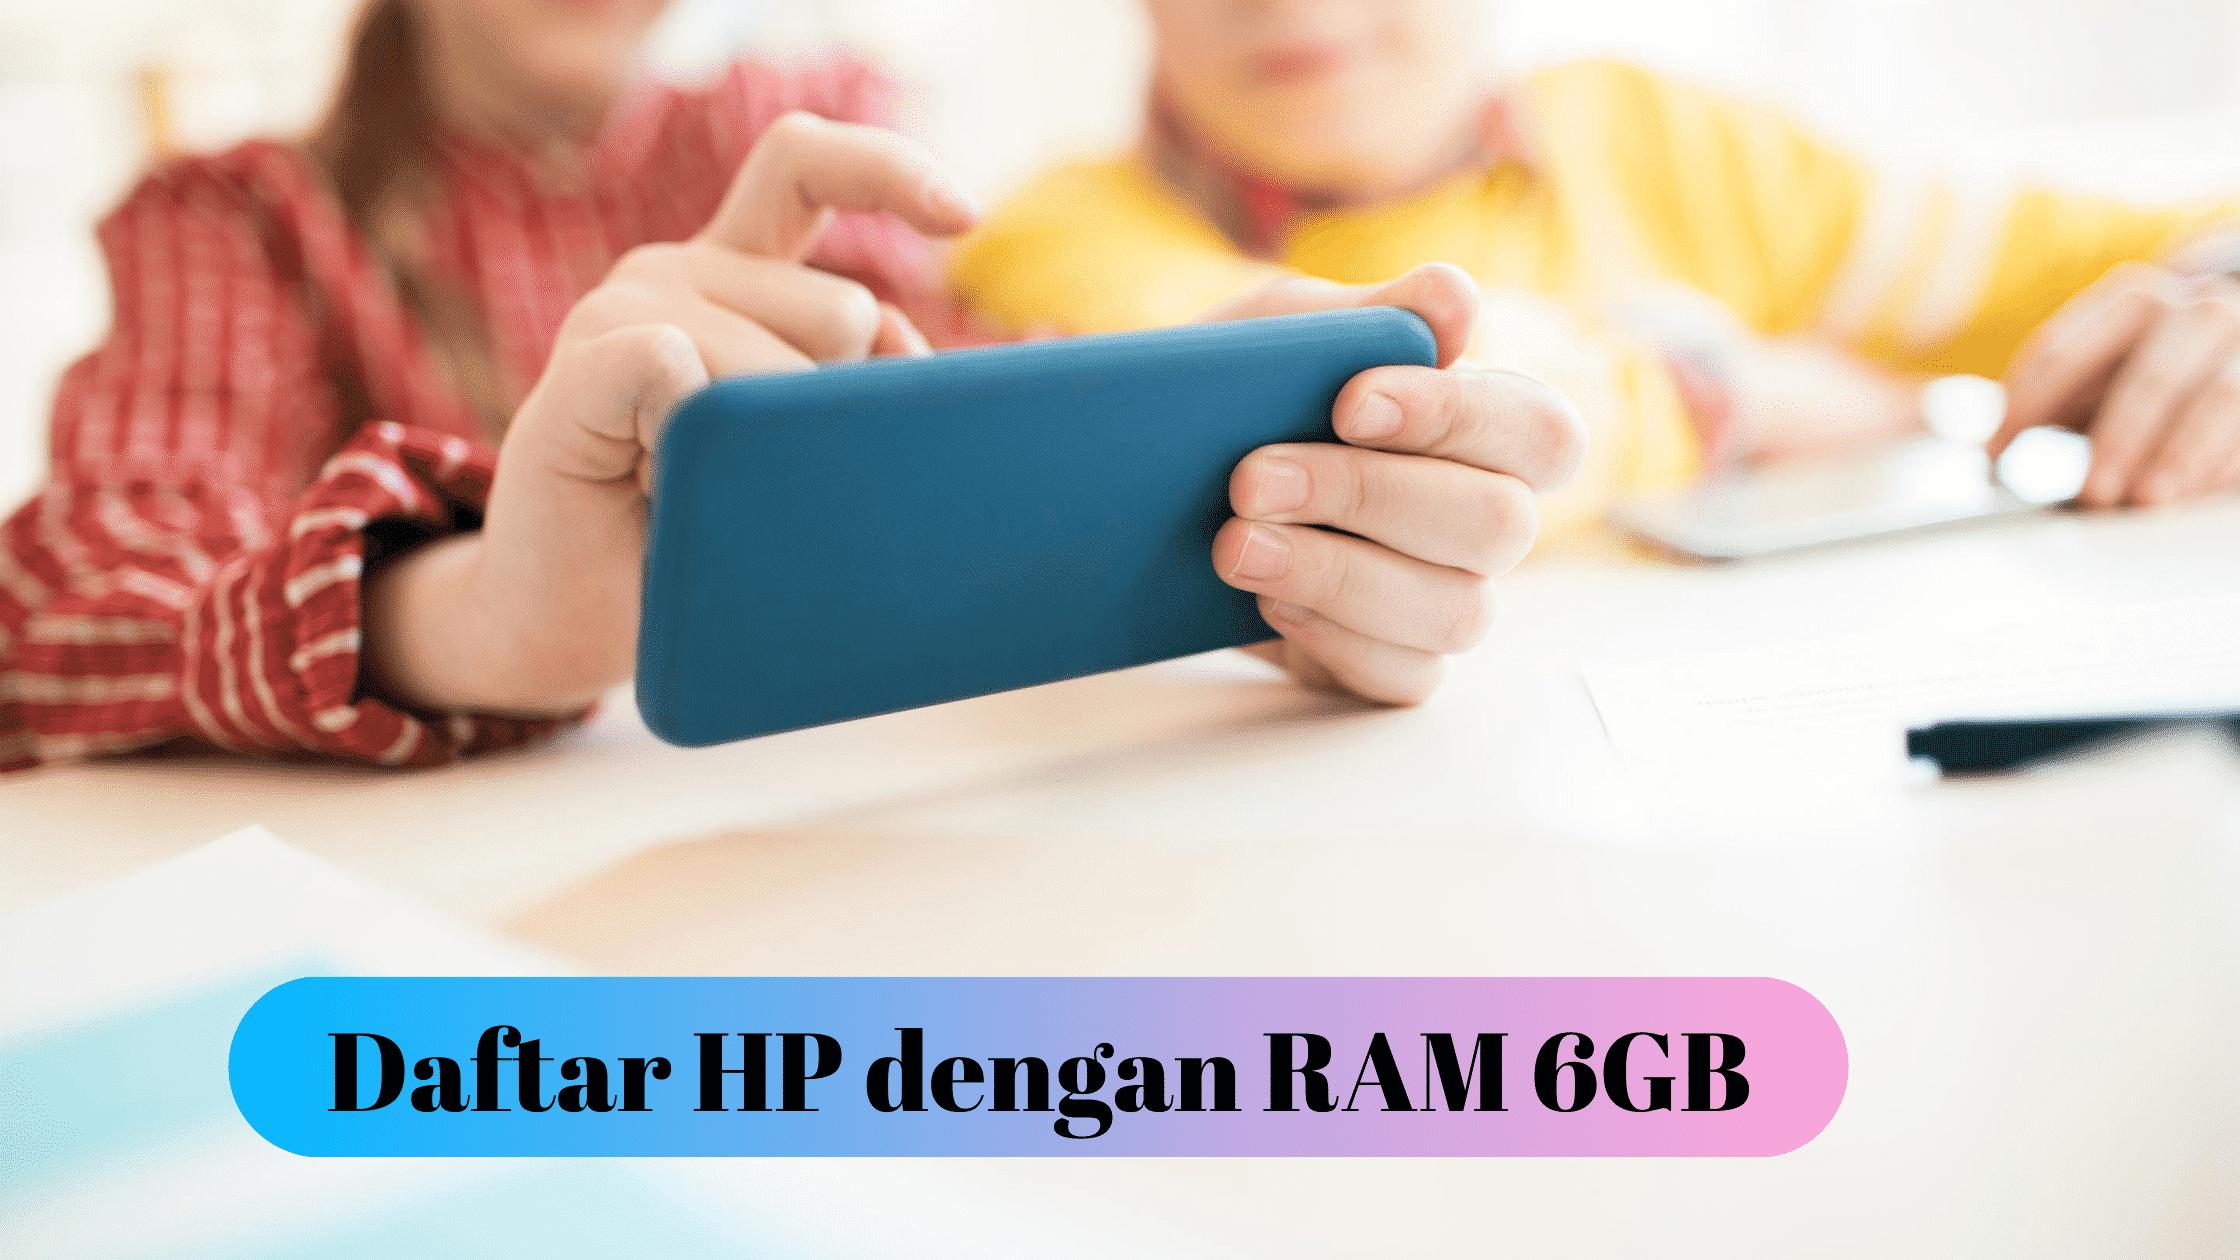 Daftar HP dengan RAM 6GB